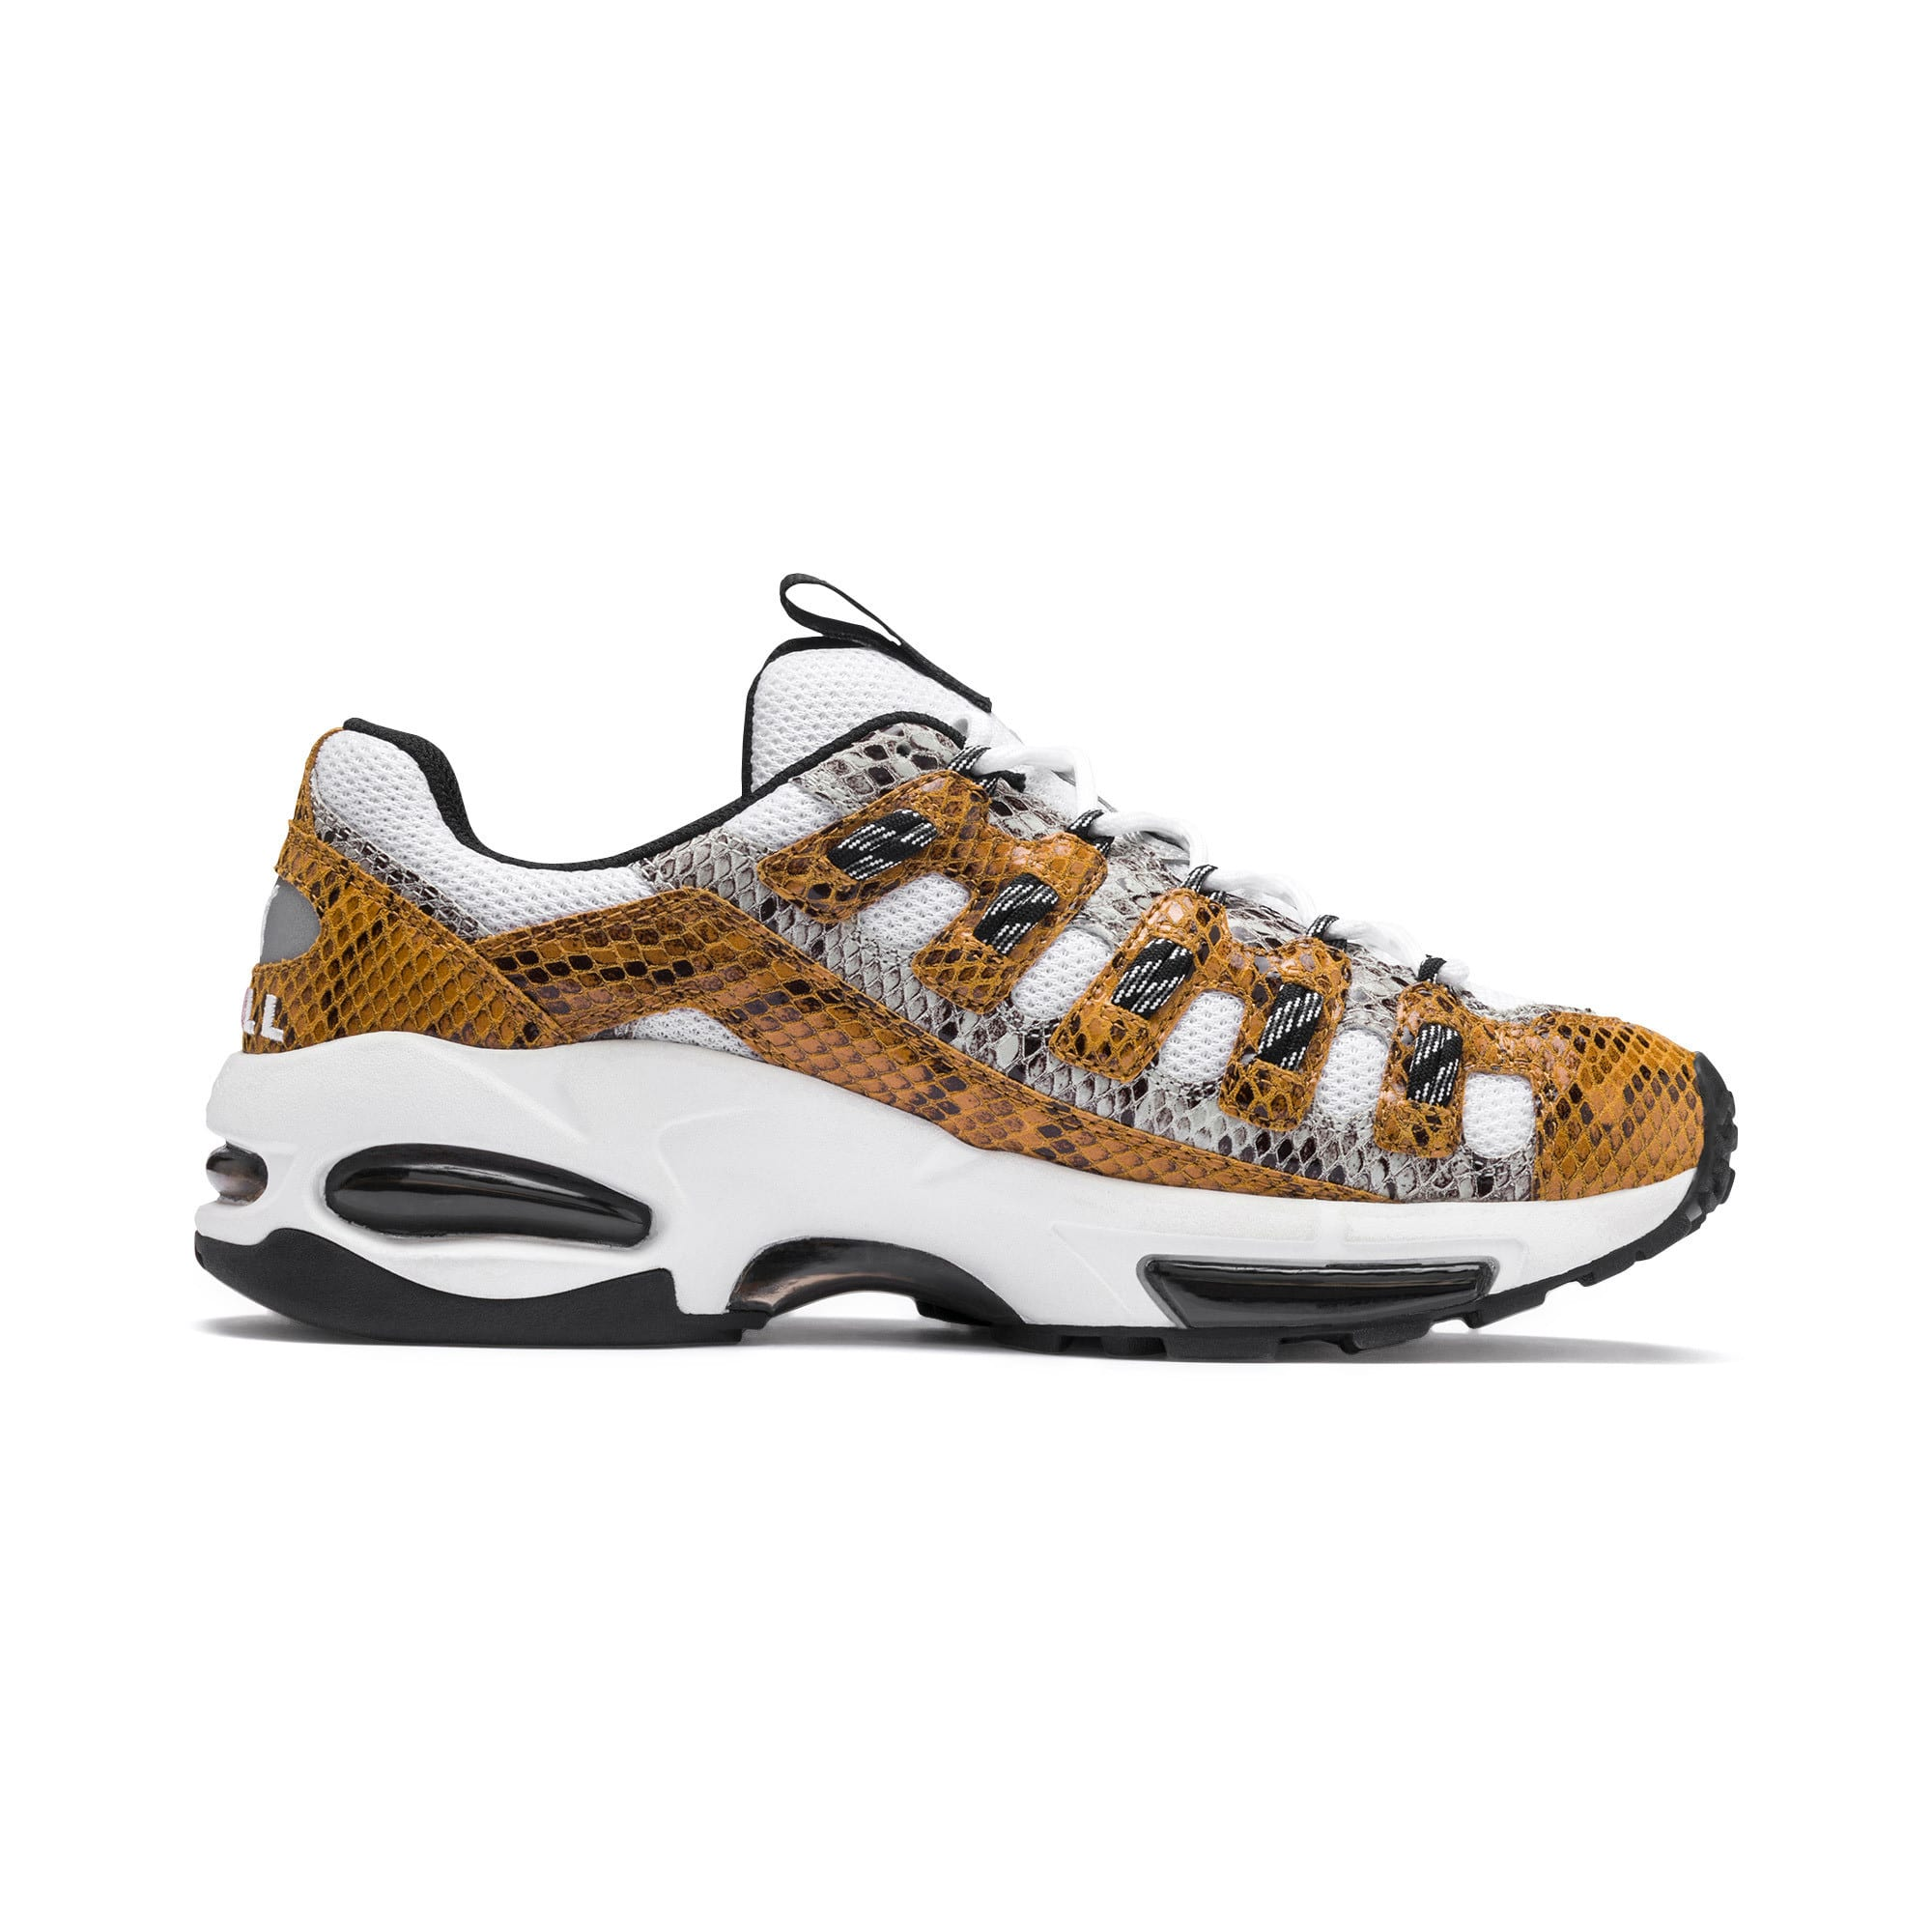 Thumbnail 6 of CELL Endura Animal Kingdom Sneakers, Puma White-Golden Orange, medium